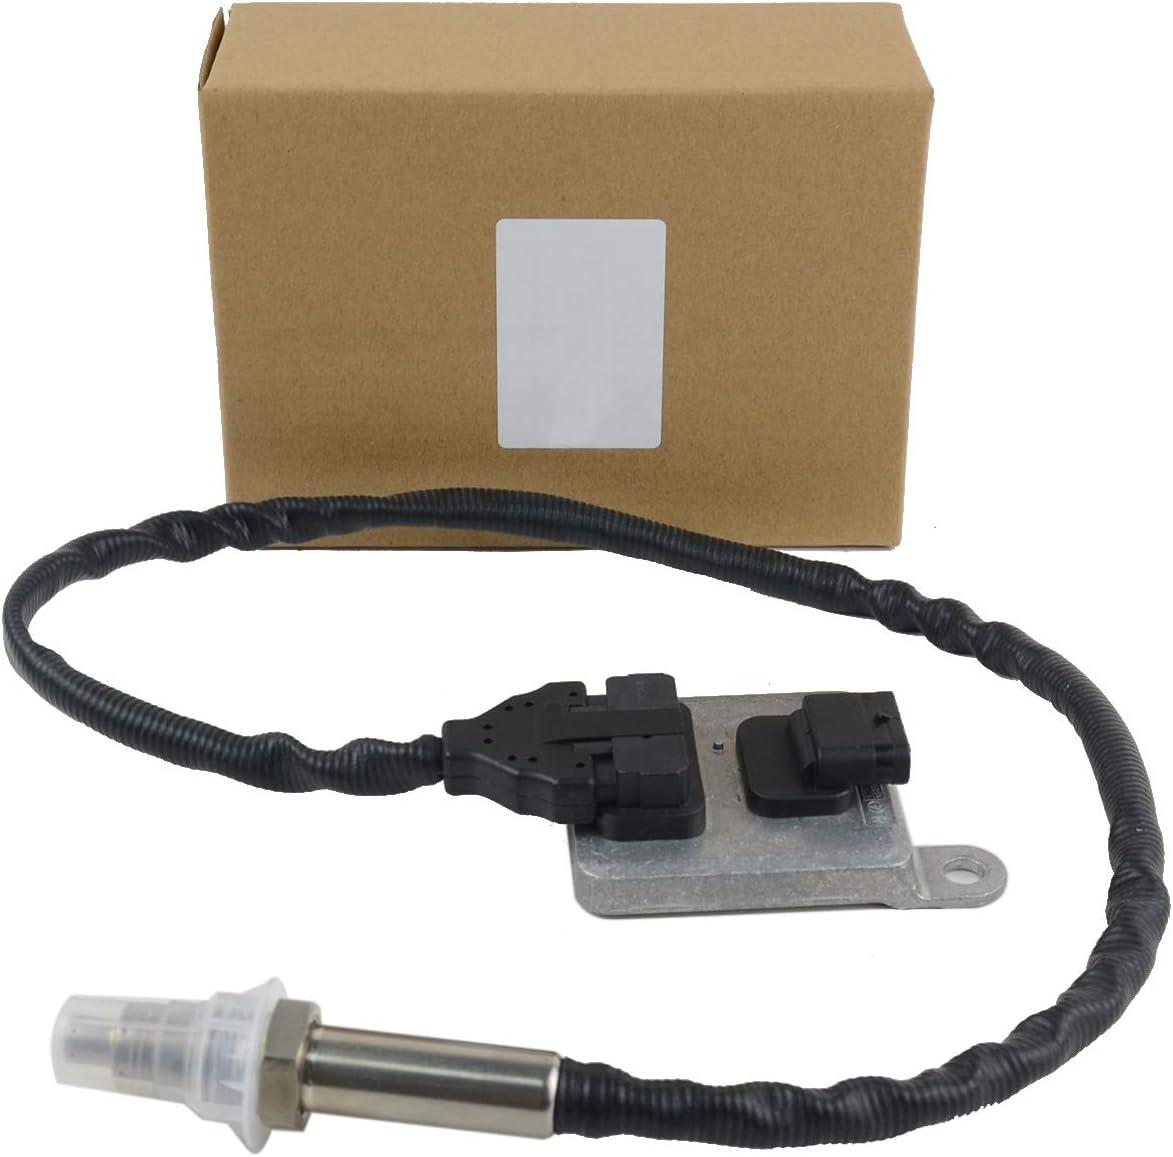 MSQ-CD NOX Sensor for VW Crafter 2.0 T 2.5T 2006-2016 03L907807AB 076907807A 076907807 5WK96690B